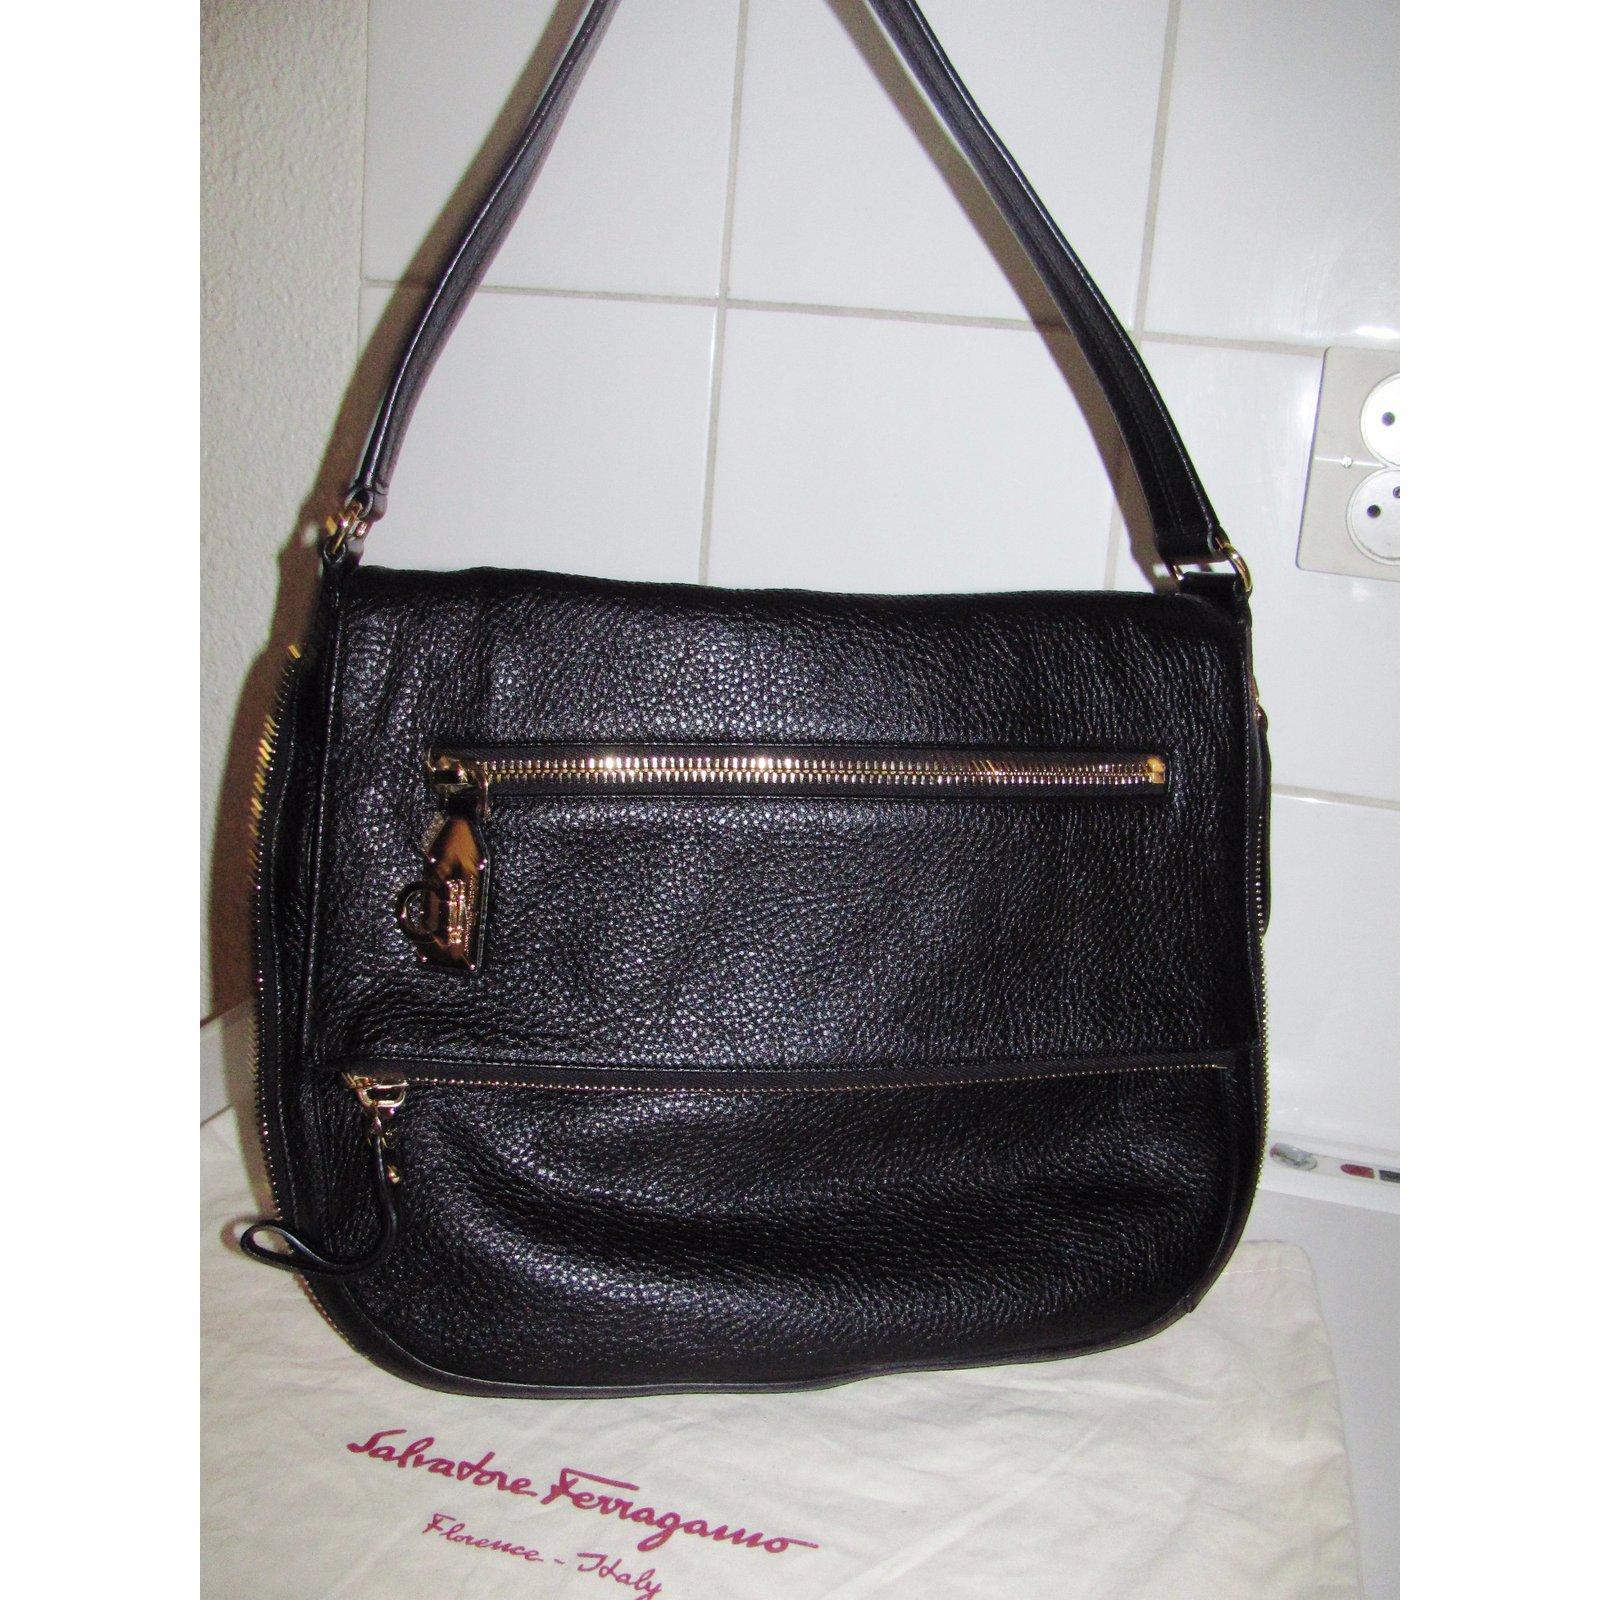 653120098f00 Facebook · Pin This. Salvatore Ferragamo Handbag Handbags Leather Black ref. 26653